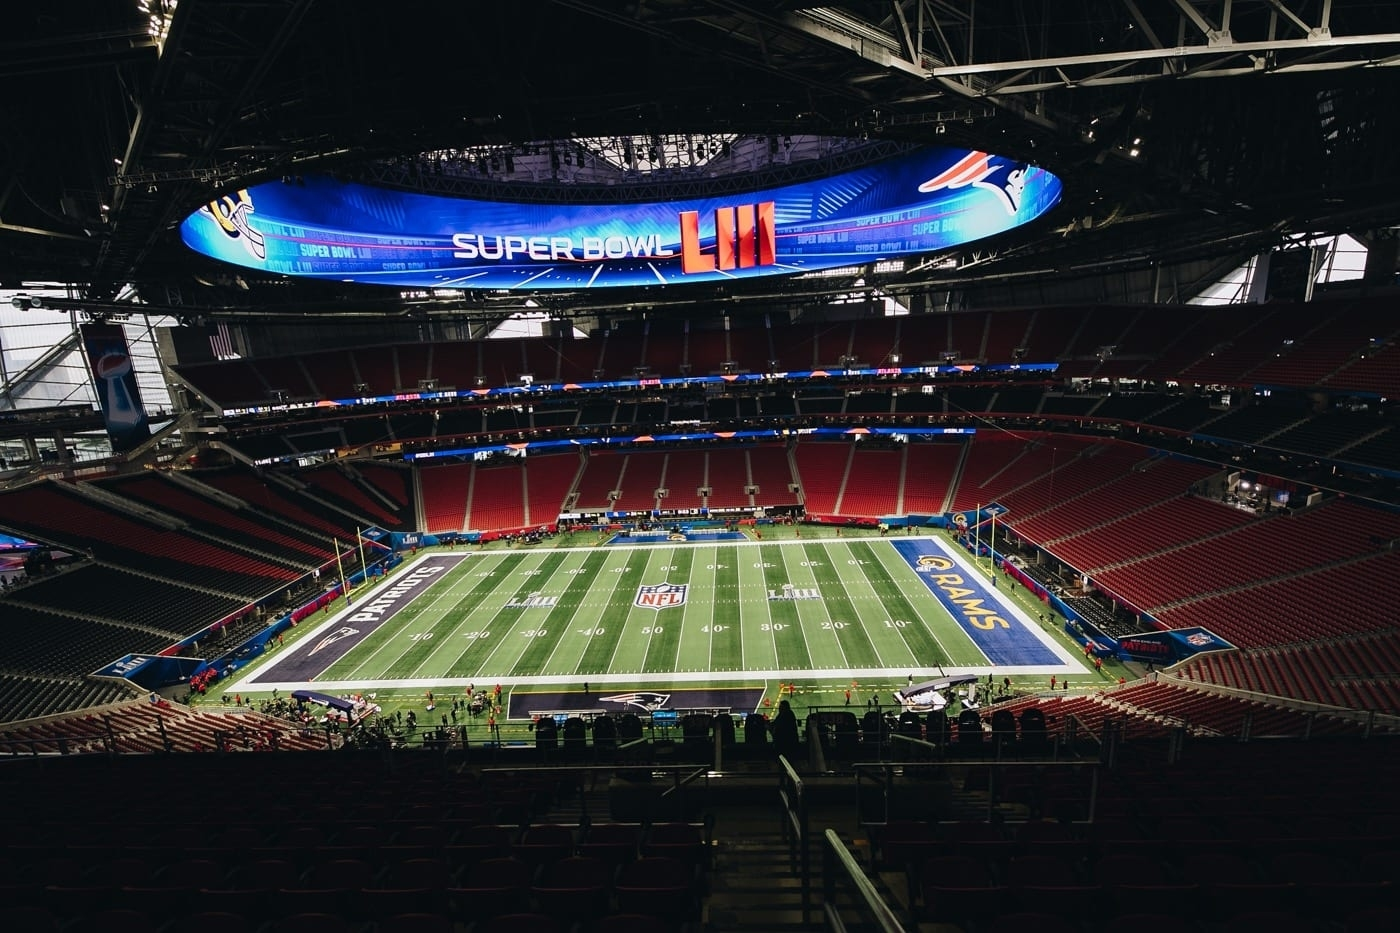 Super Bowl Liii - Mercedes Benz Stadium throughout Super Bowl Liii Seating Chart